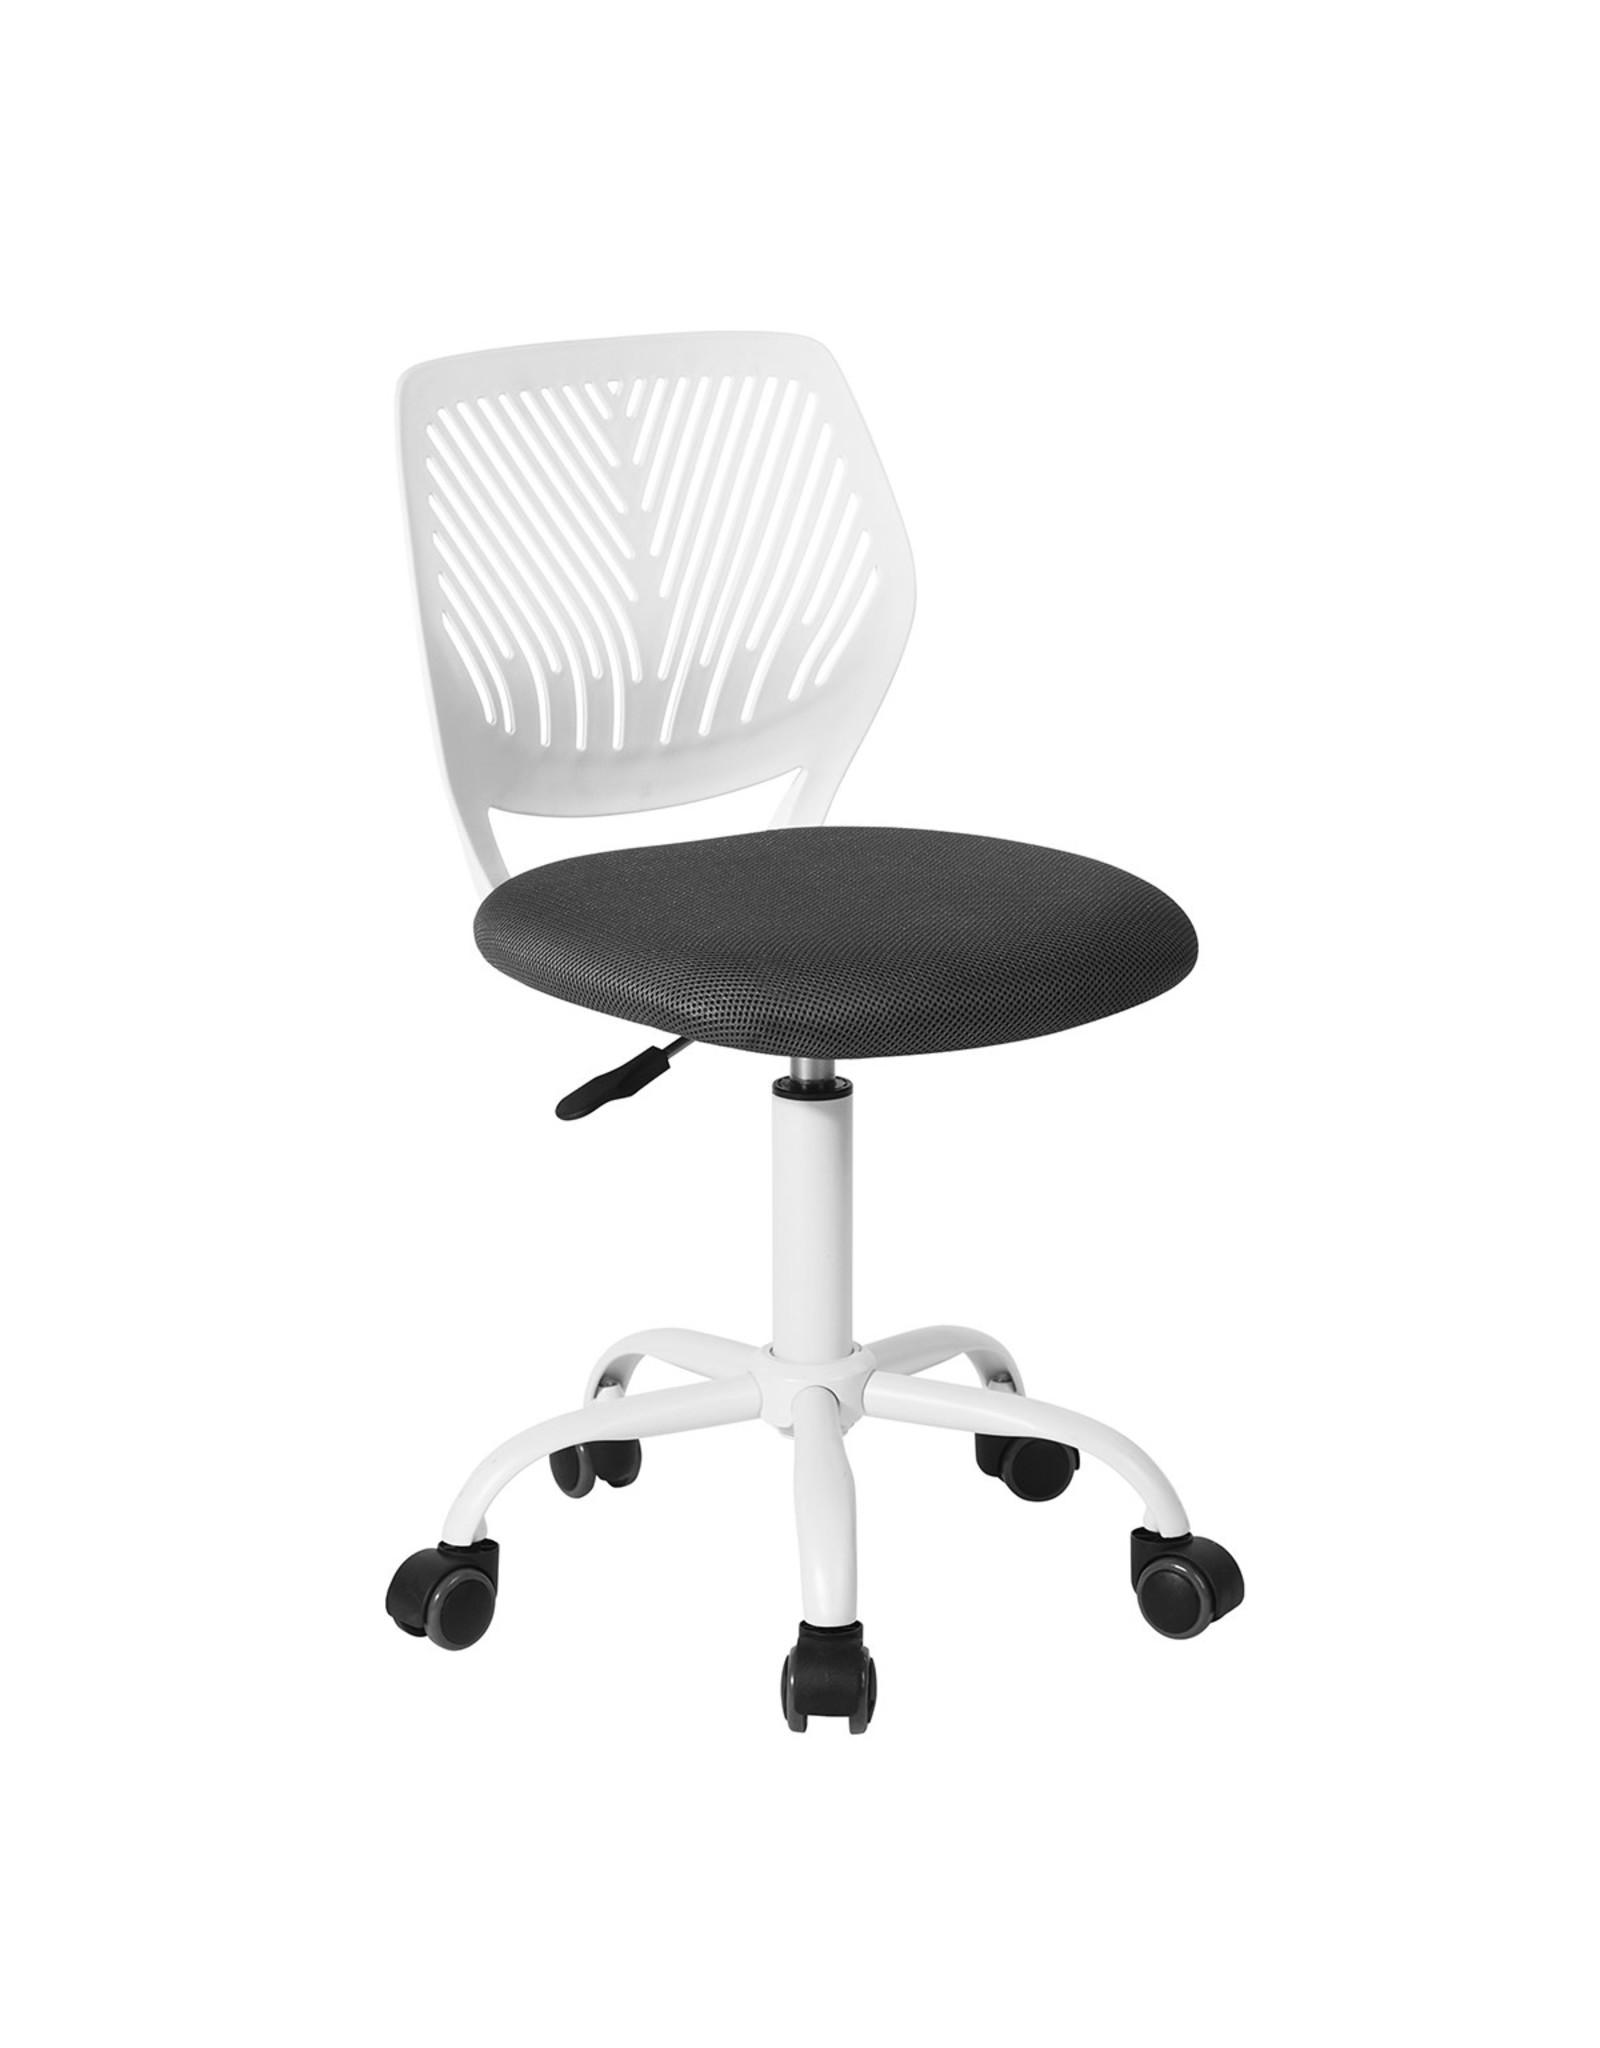 Chair - Task Chair - Height Adjustable - Gray